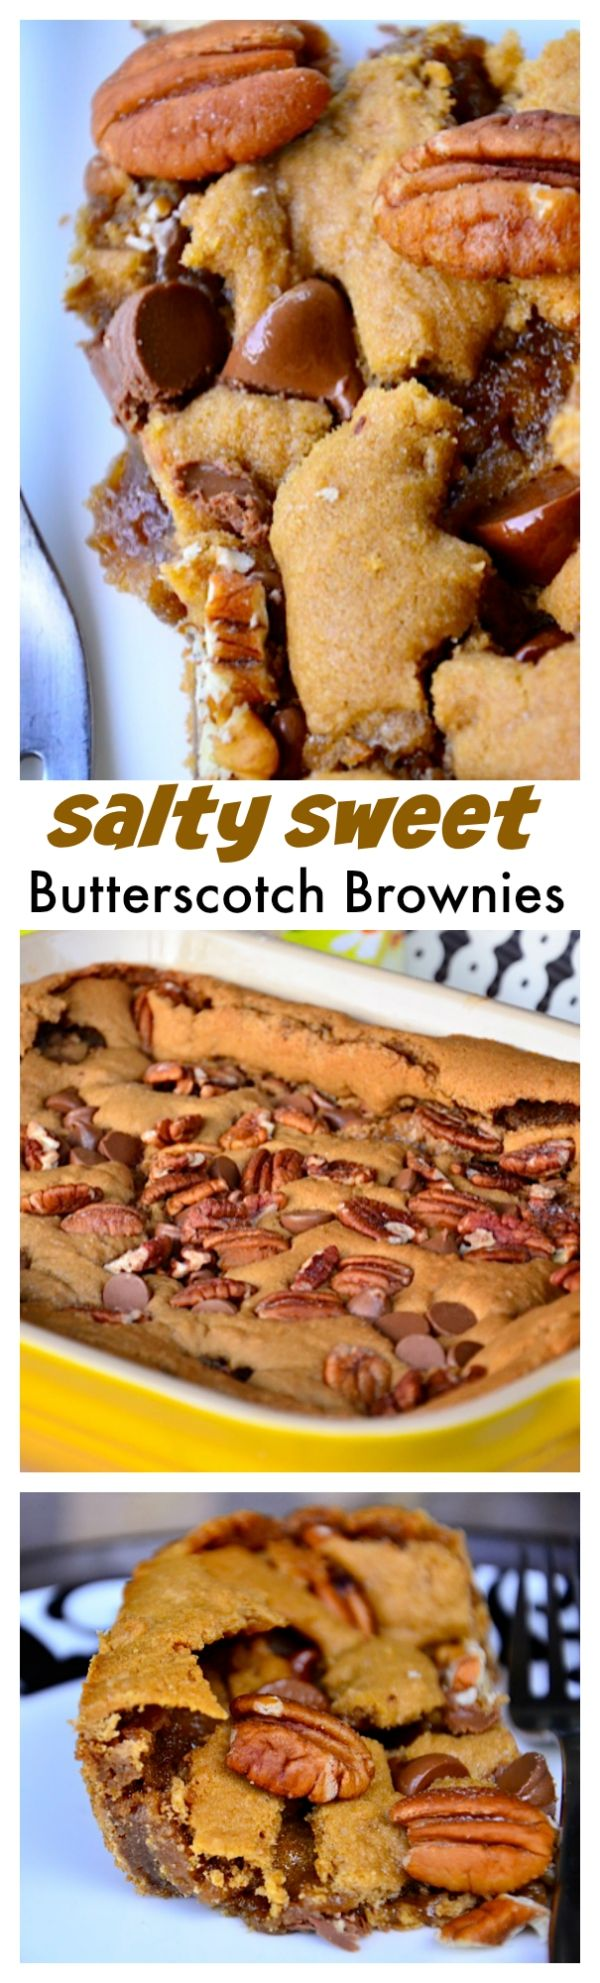 Salty Sweet Butterscotch Brownies | ReluctantEntertainer.com